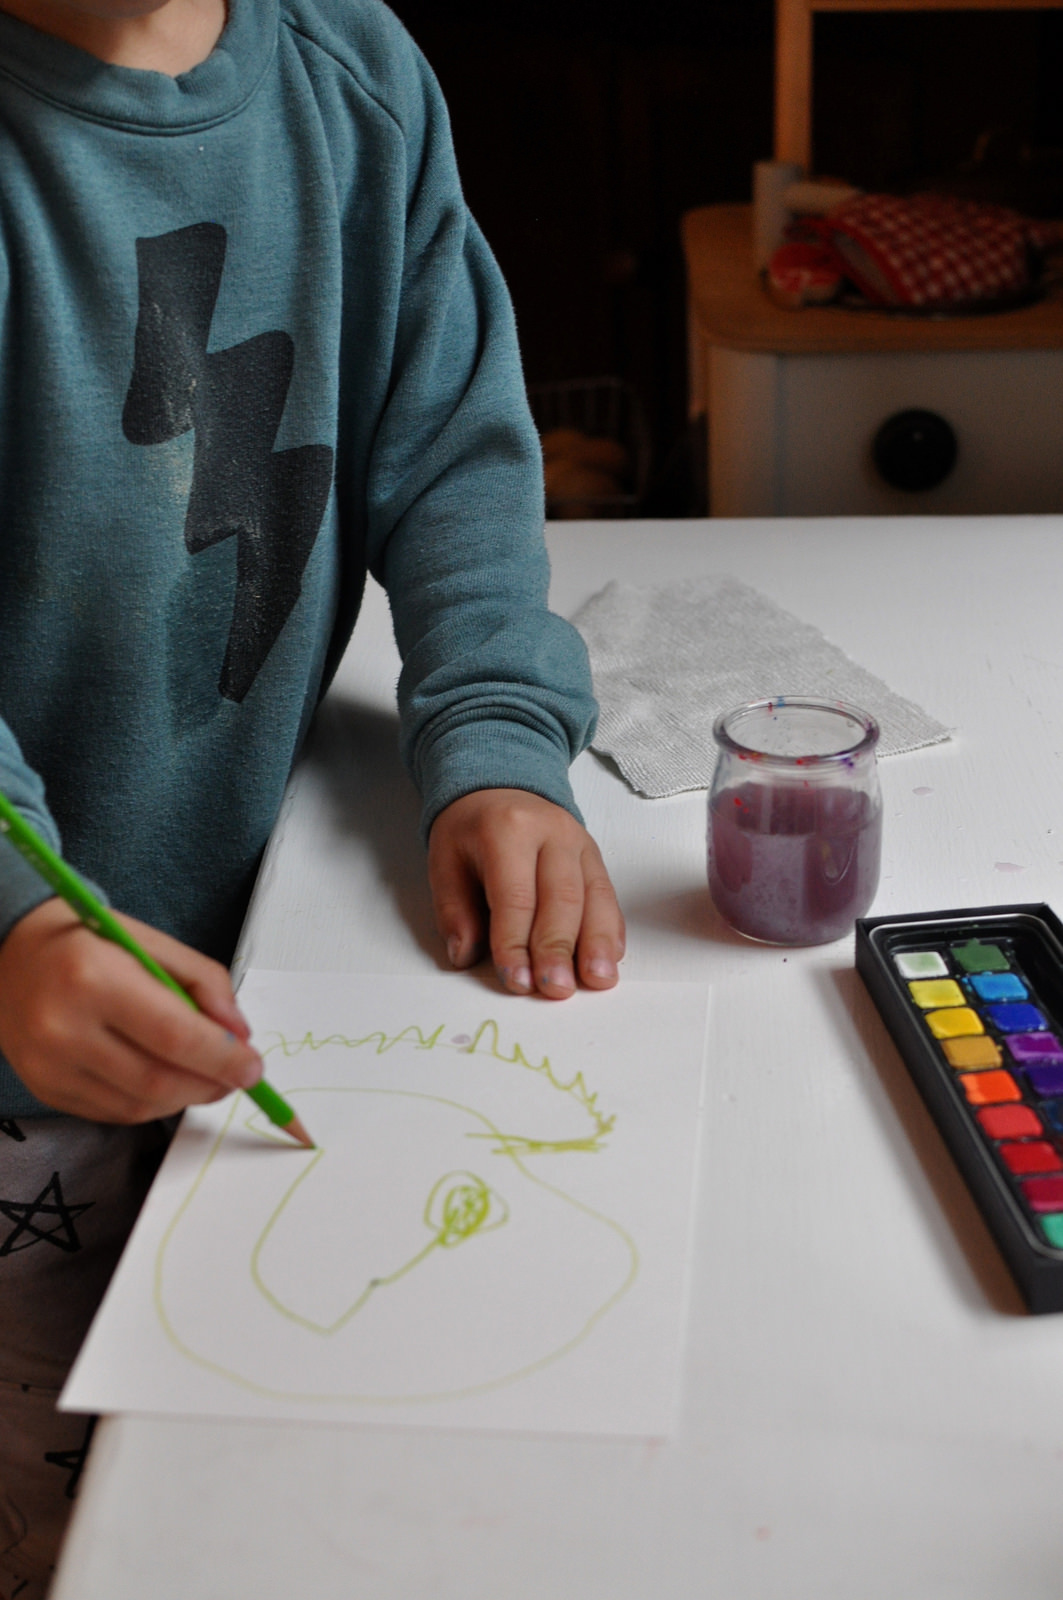 Montessori-Inspired: Watercolors